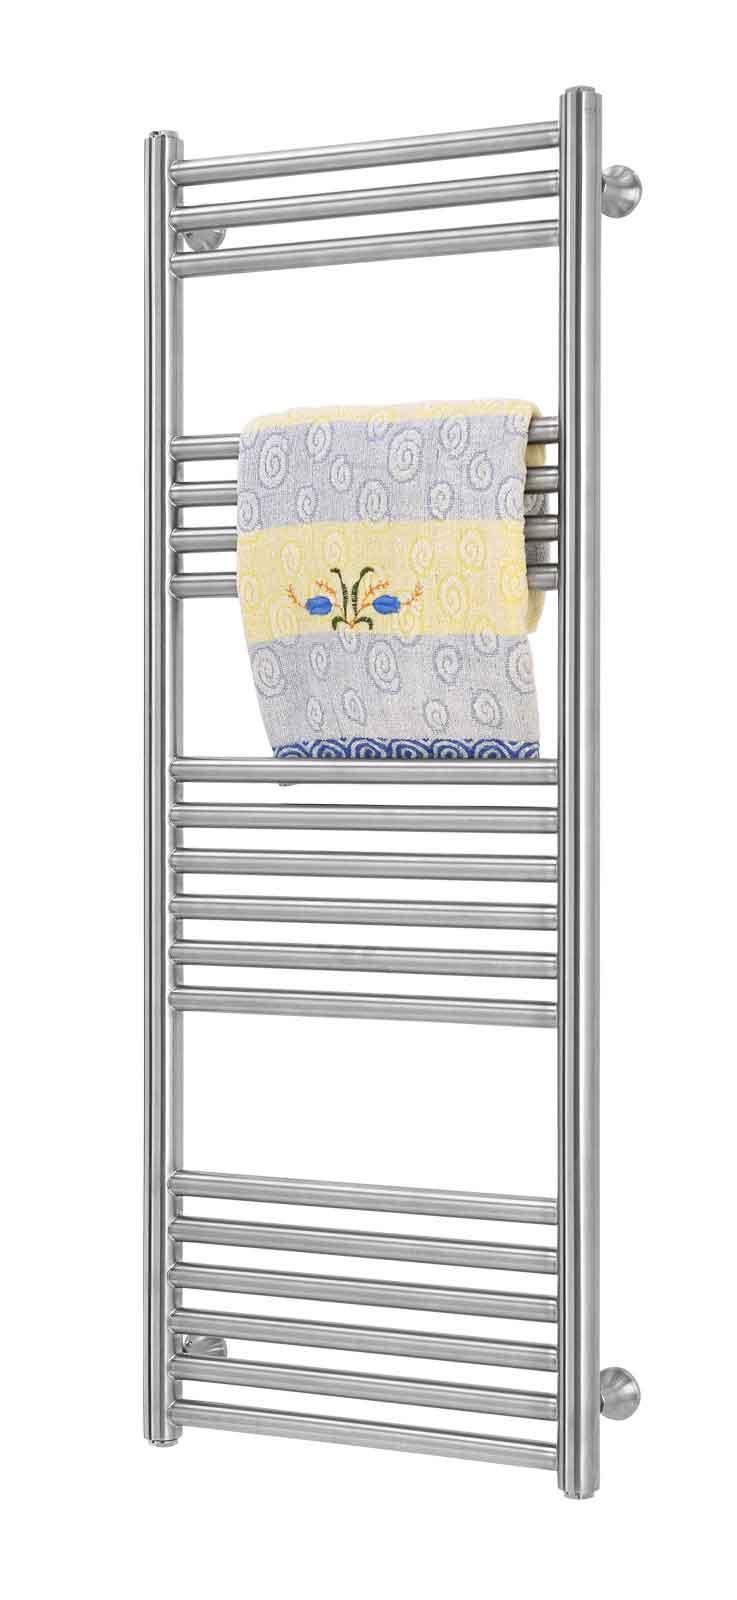 Nobless-120 x 50-rostfri handdukstork